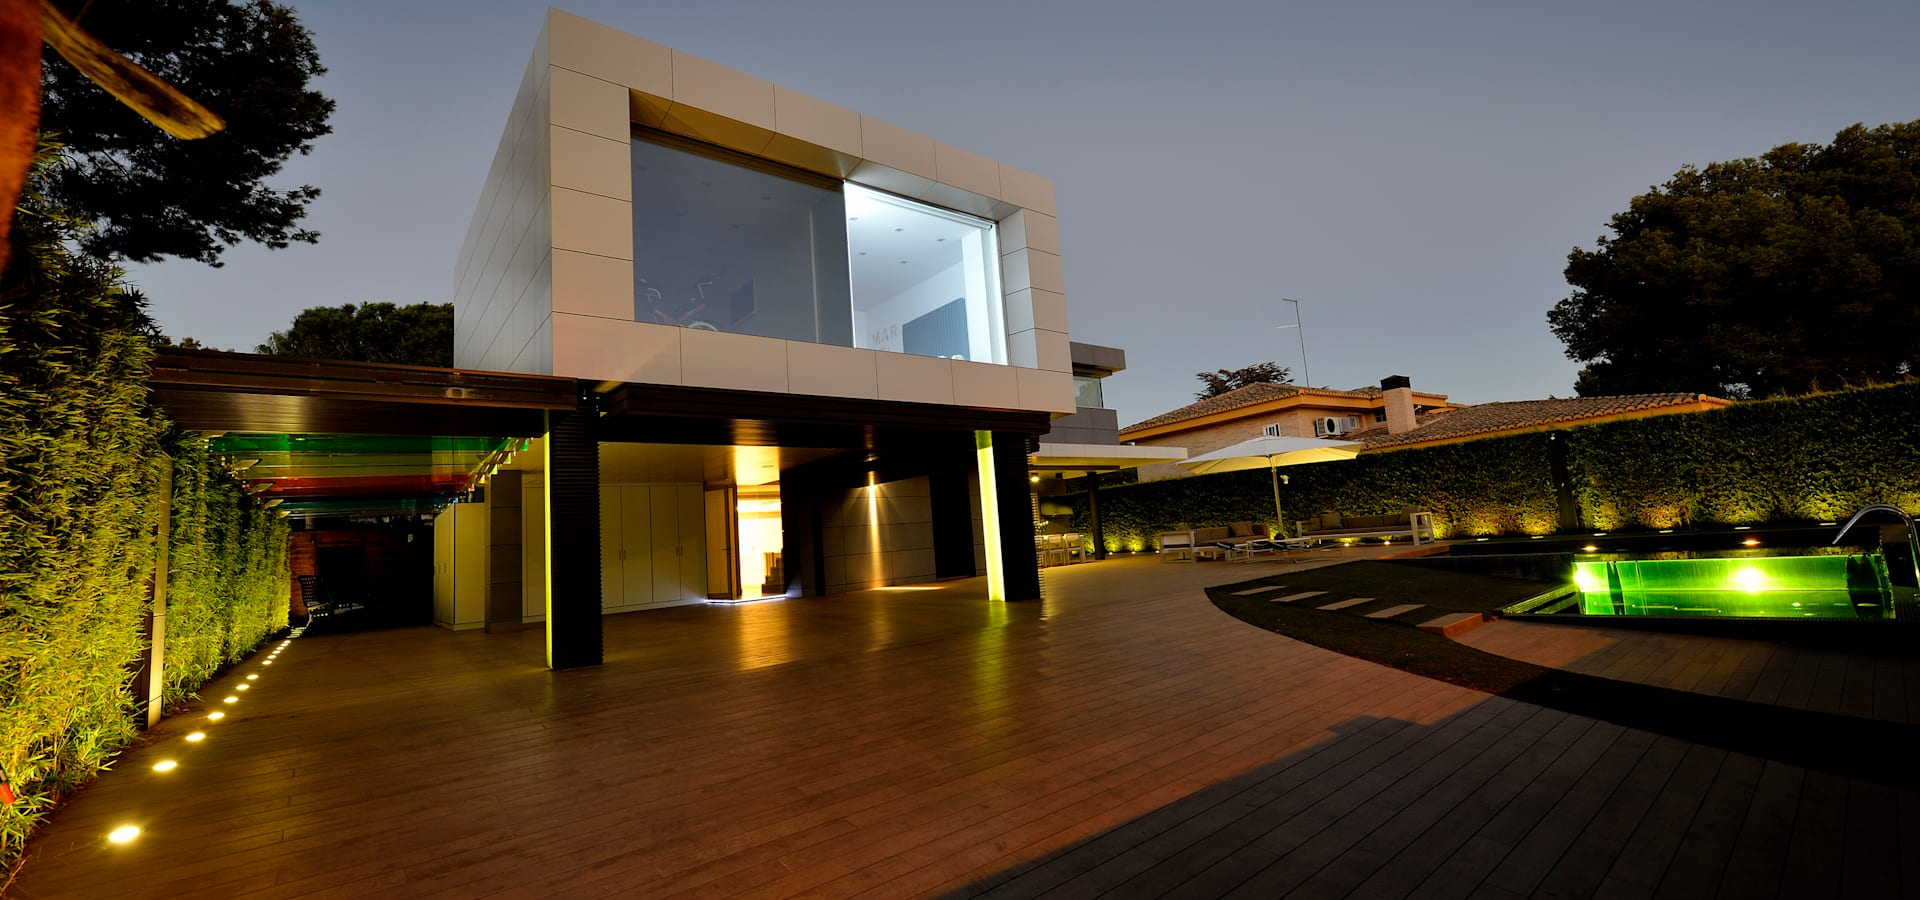 Duart vila arquitectes s l p arquitectos en albal homify - Casas en albal ...